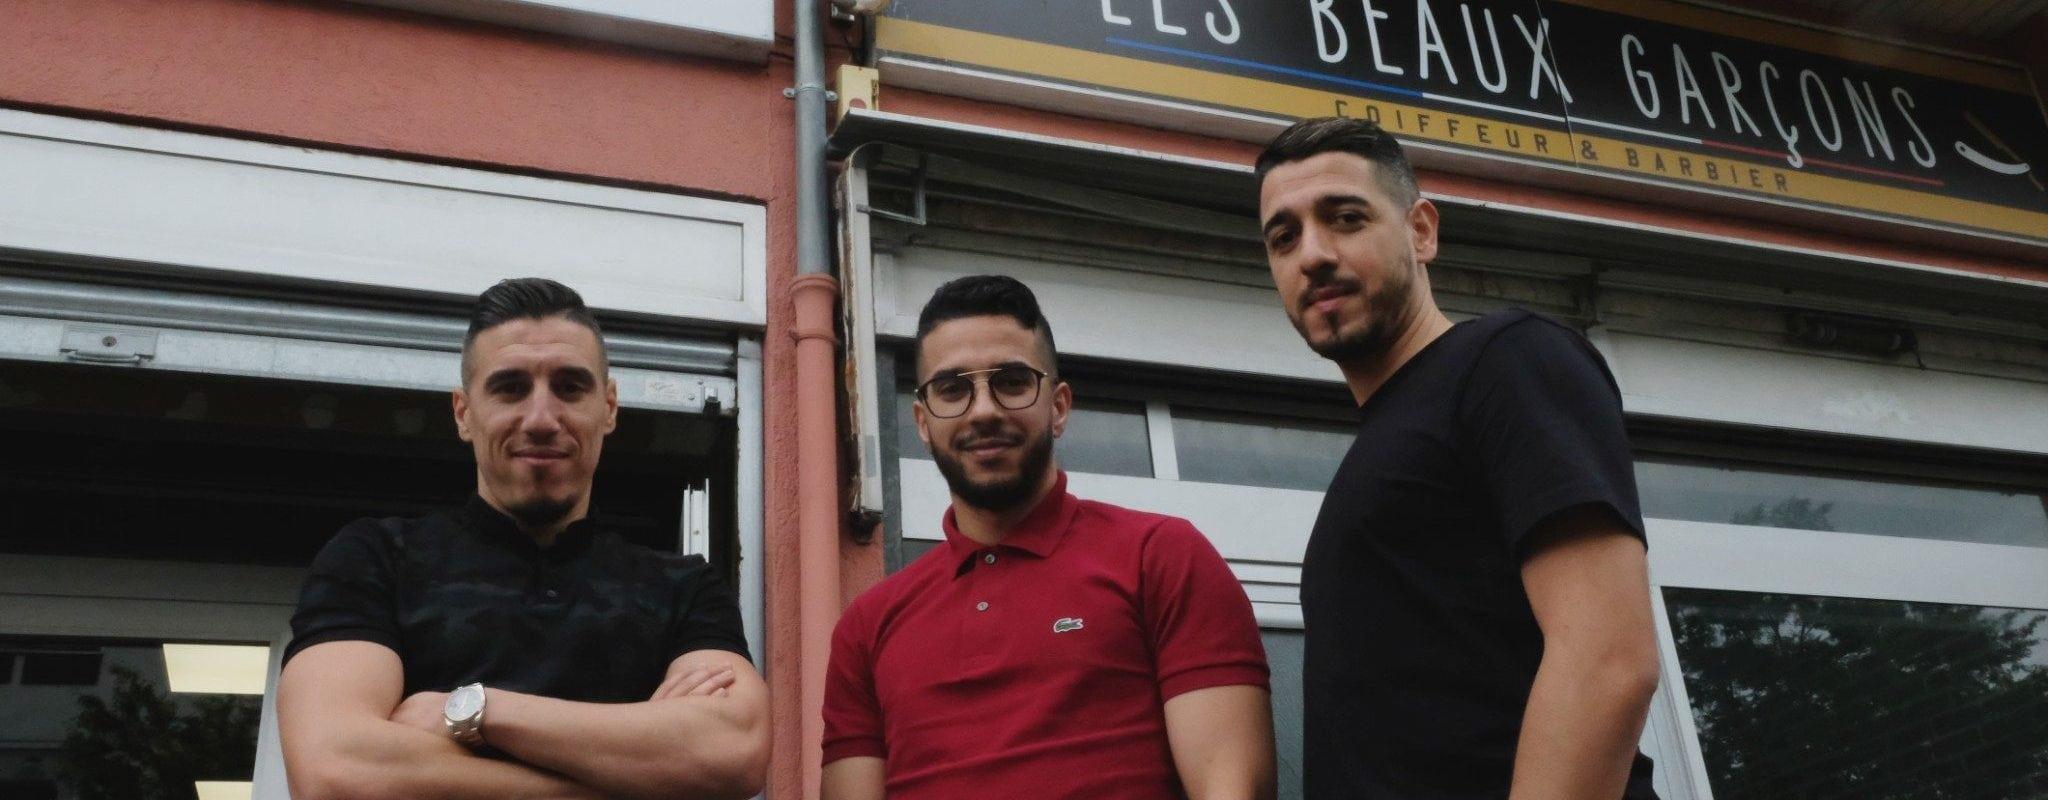 Coiffeur, restaurant, local associatif… Les frères El Jadeyaoui font du bien à l'Elsau